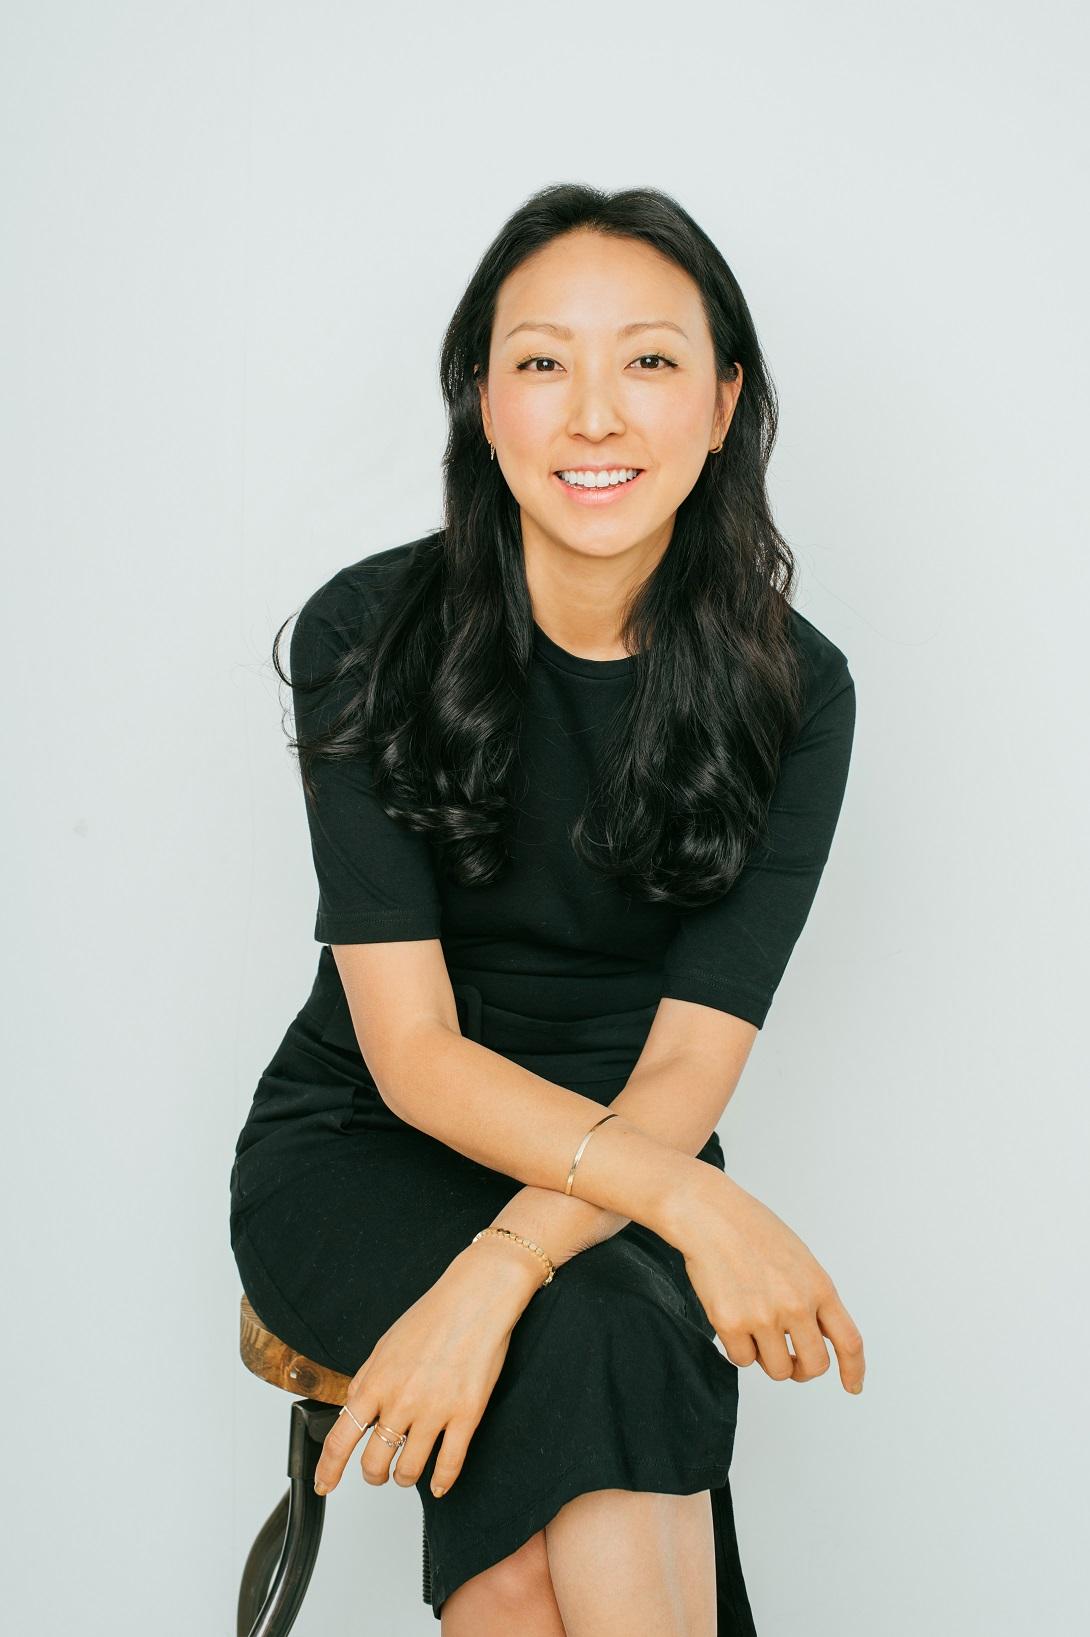 La gallerista Esther Kim Varet